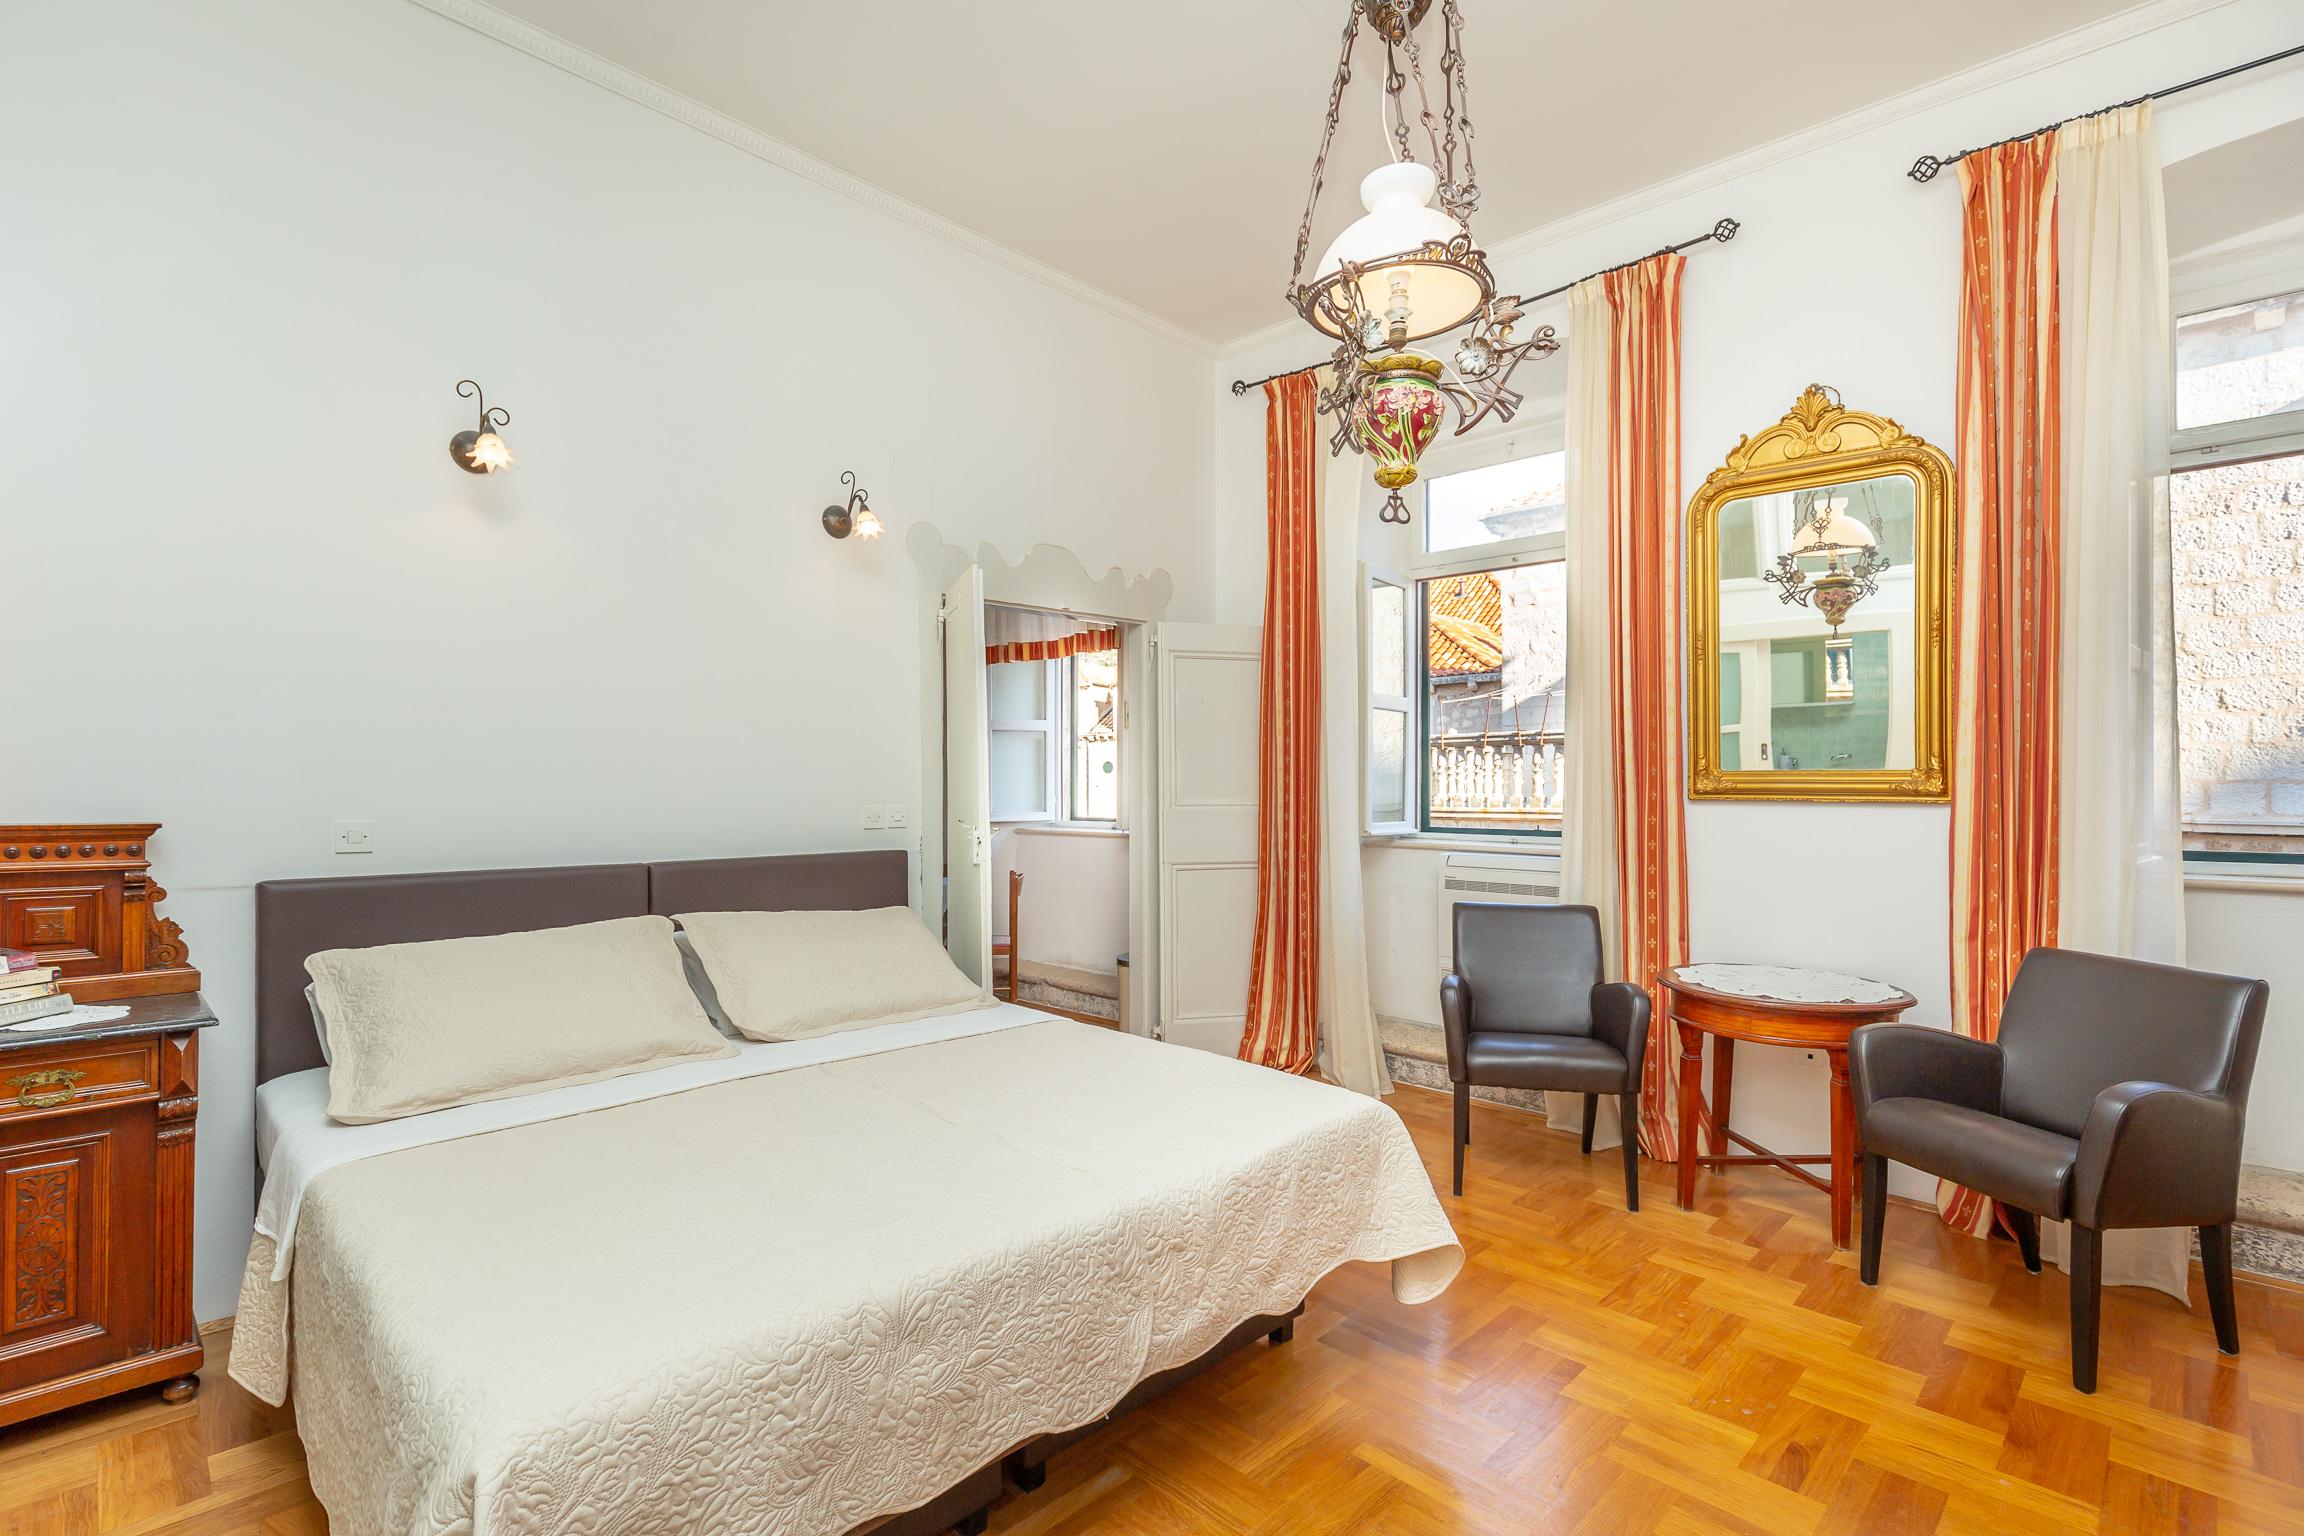 Apartamente Placa Studio 1 50090, Dubrovnik, Dubrovnik, Regiunea Dubrovnic-Neretva